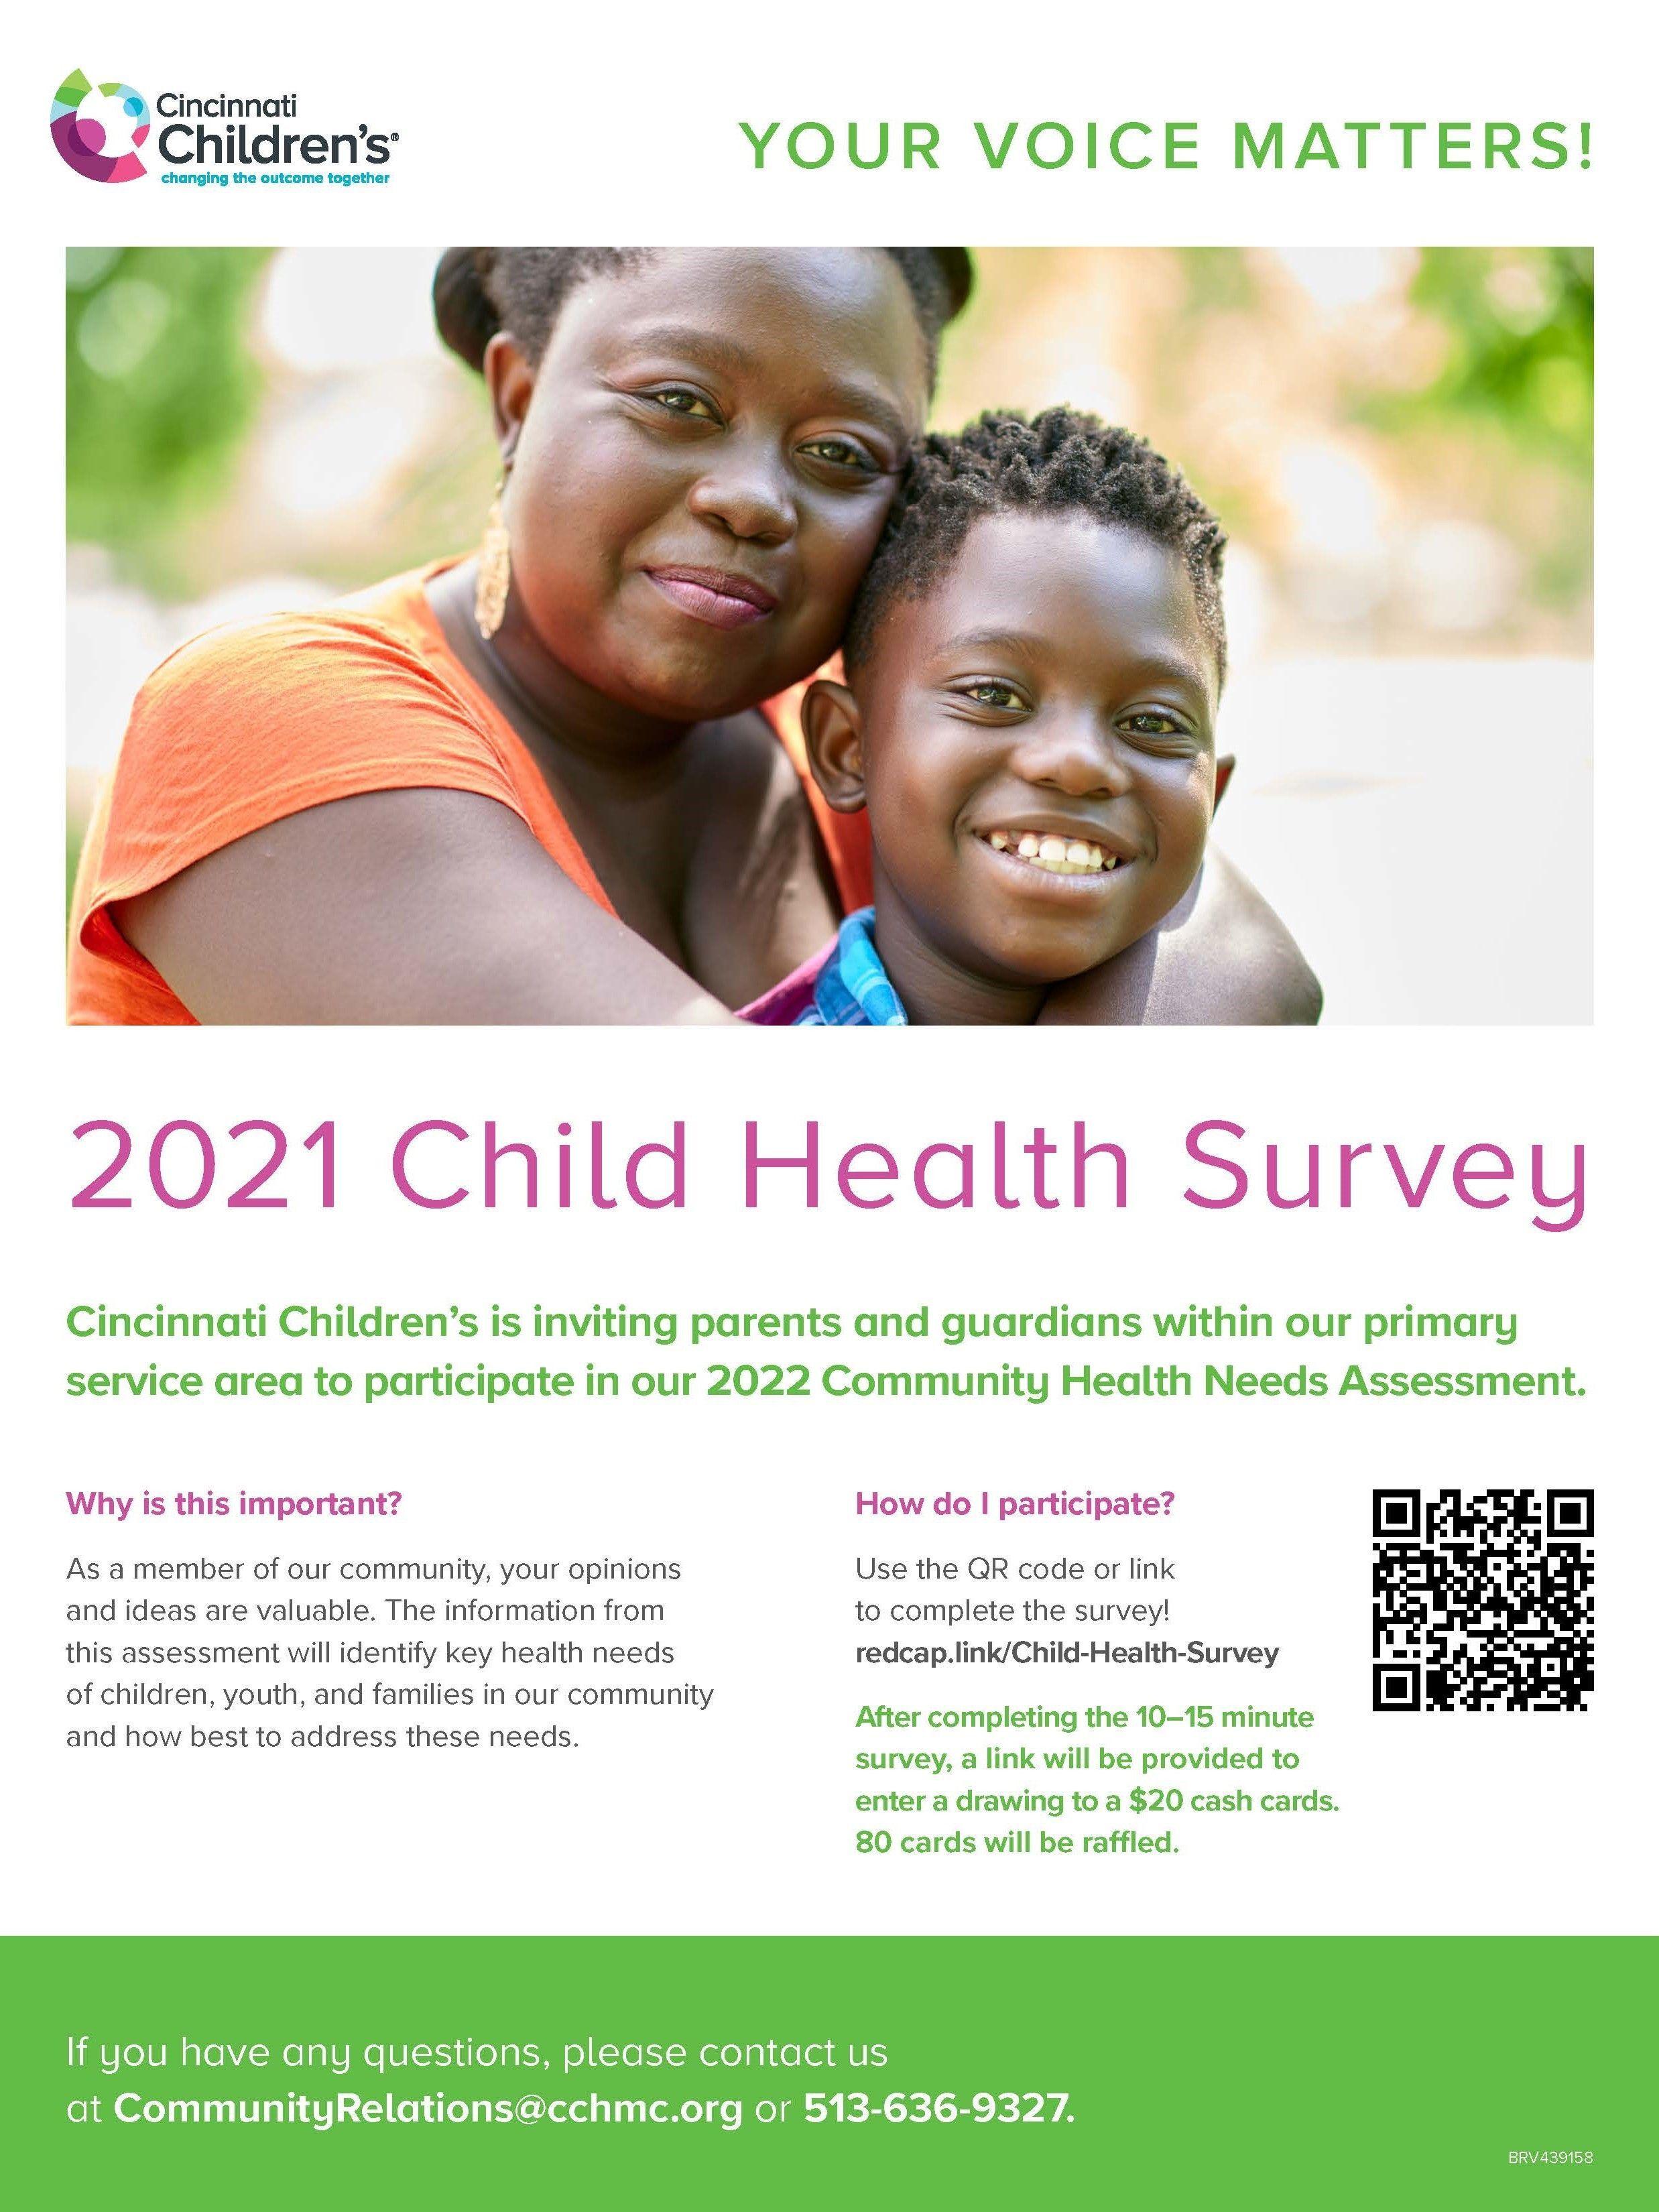 Cincinnati Children's Child Health Survey